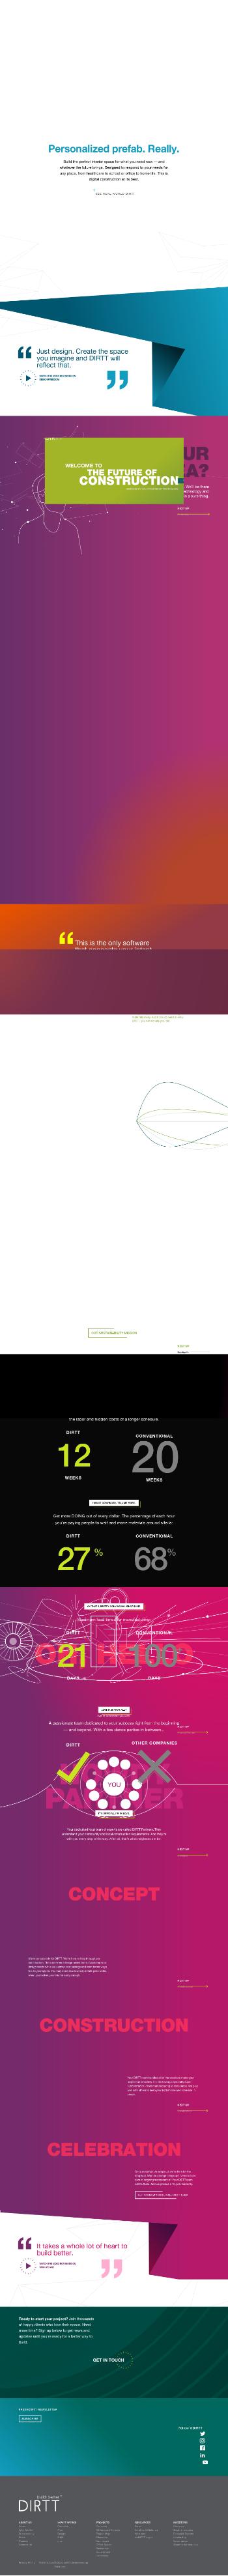 DIRTT Environmental Solutions Ltd. Website Screenshot